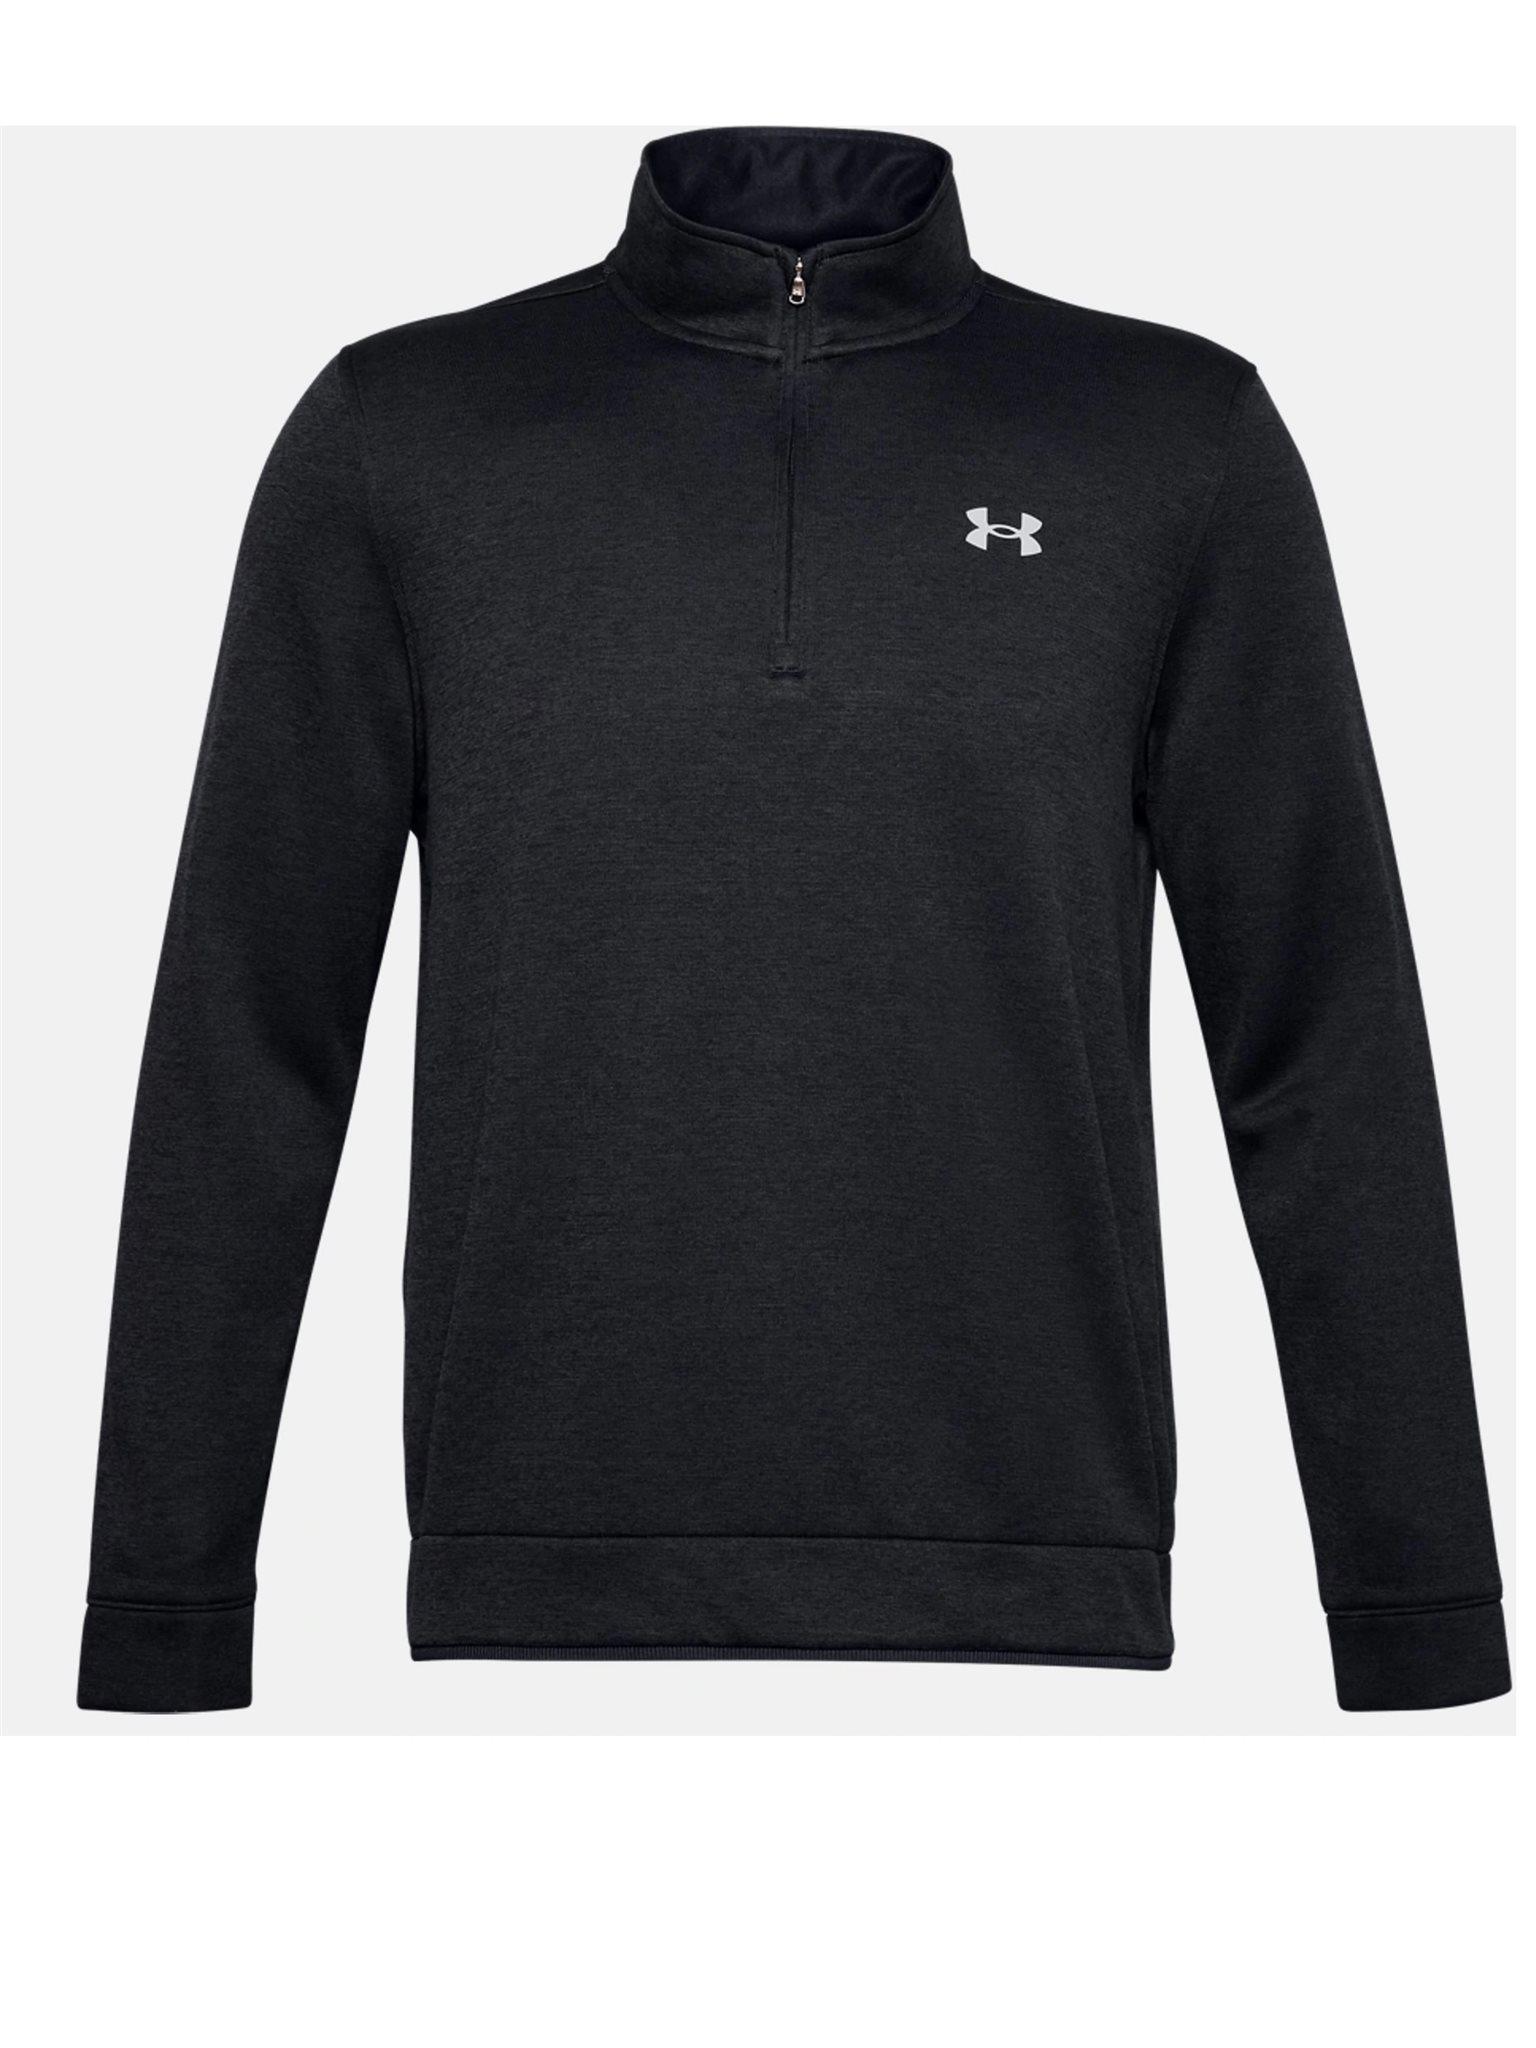 Under Armour heren golfsweater Storm zwart melee